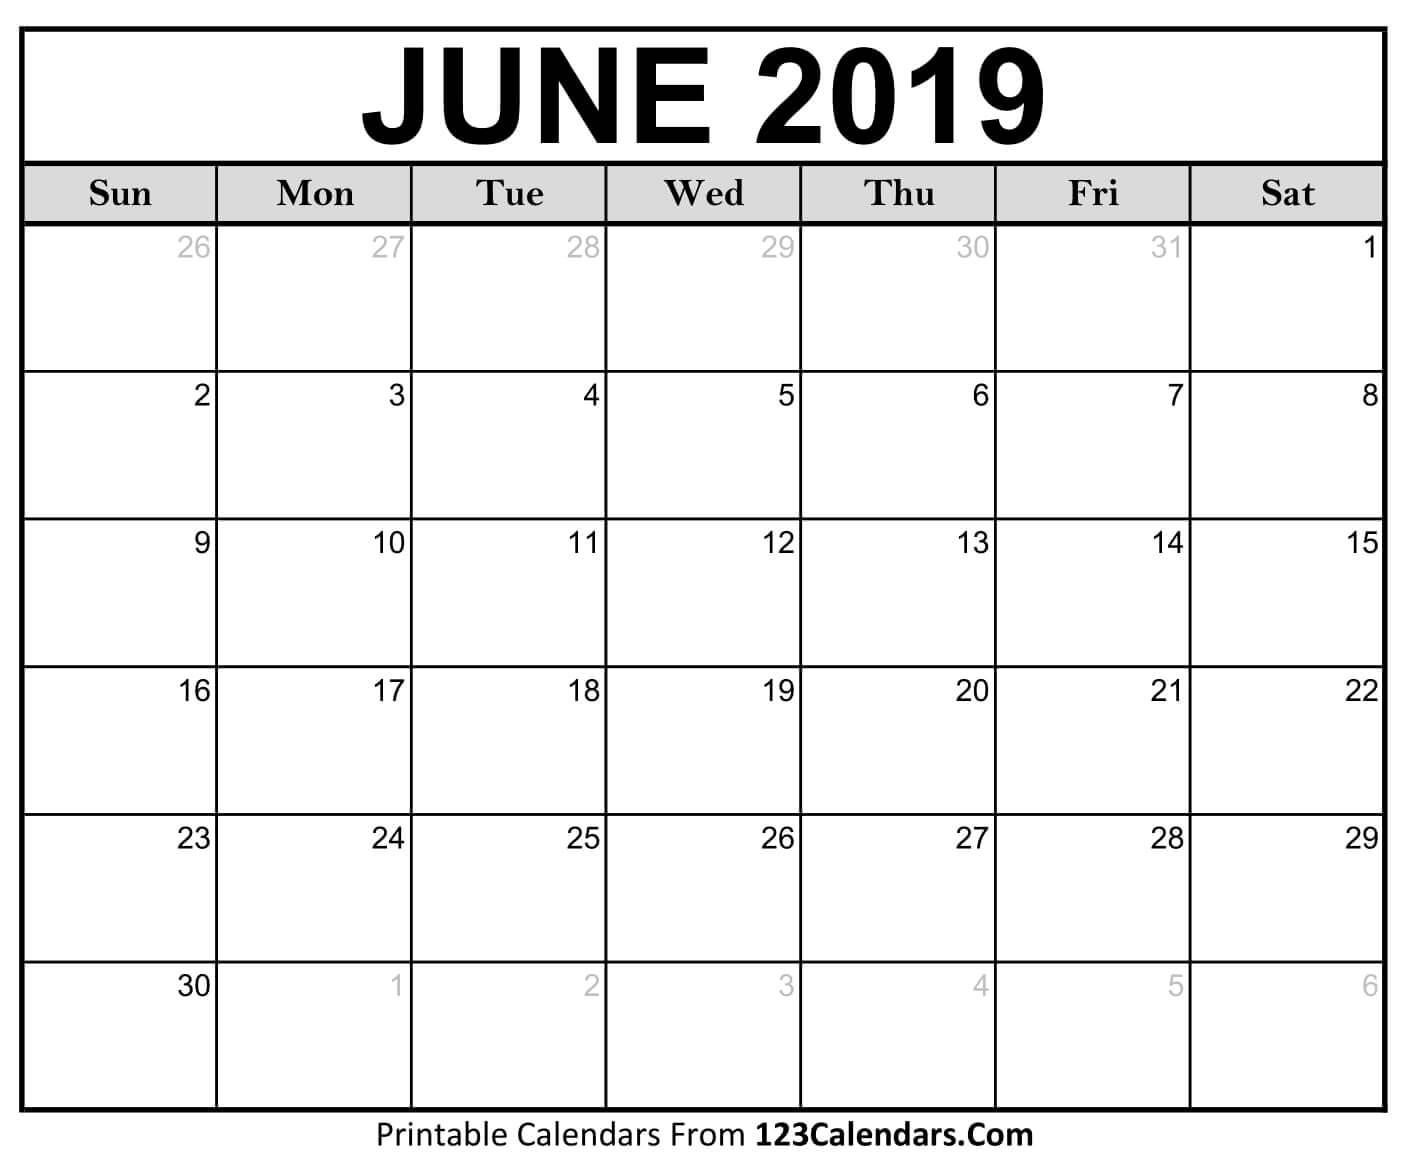 June Calendar 2019 PDF